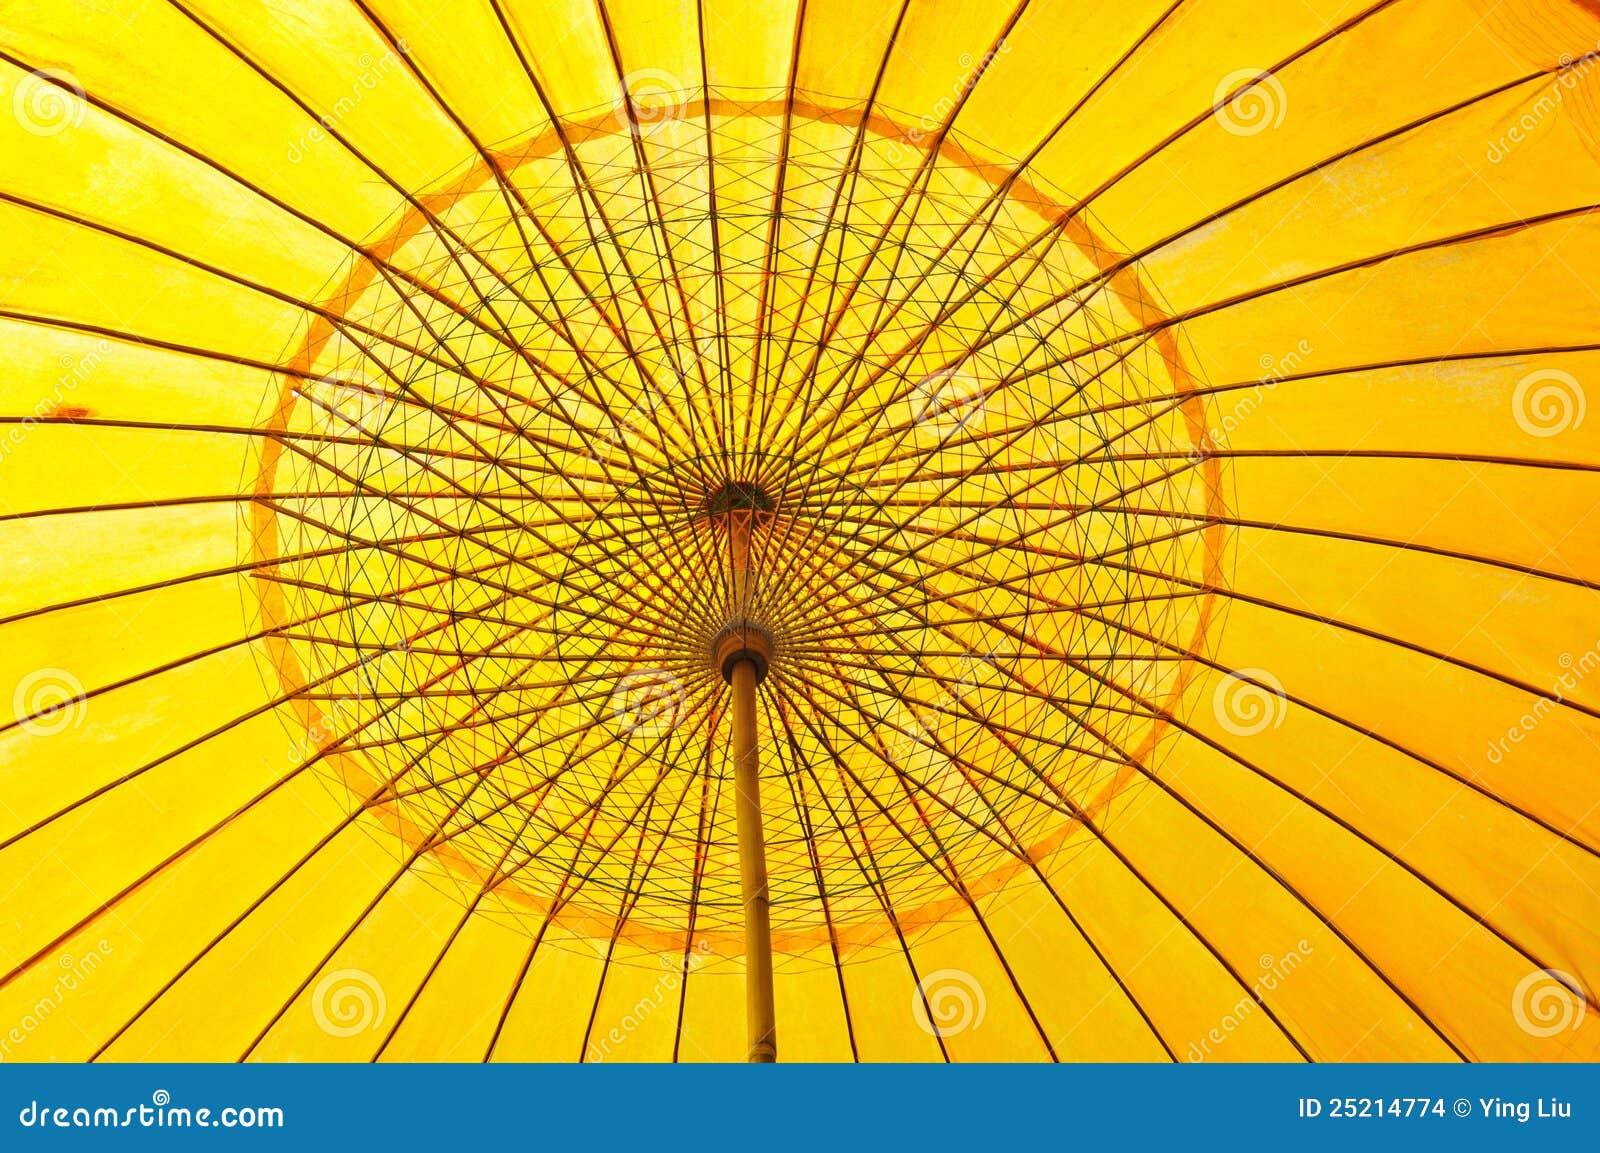 one yellow umbrella in row of blue umbrellas stock illustration 61008670. Black Bedroom Furniture Sets. Home Design Ideas